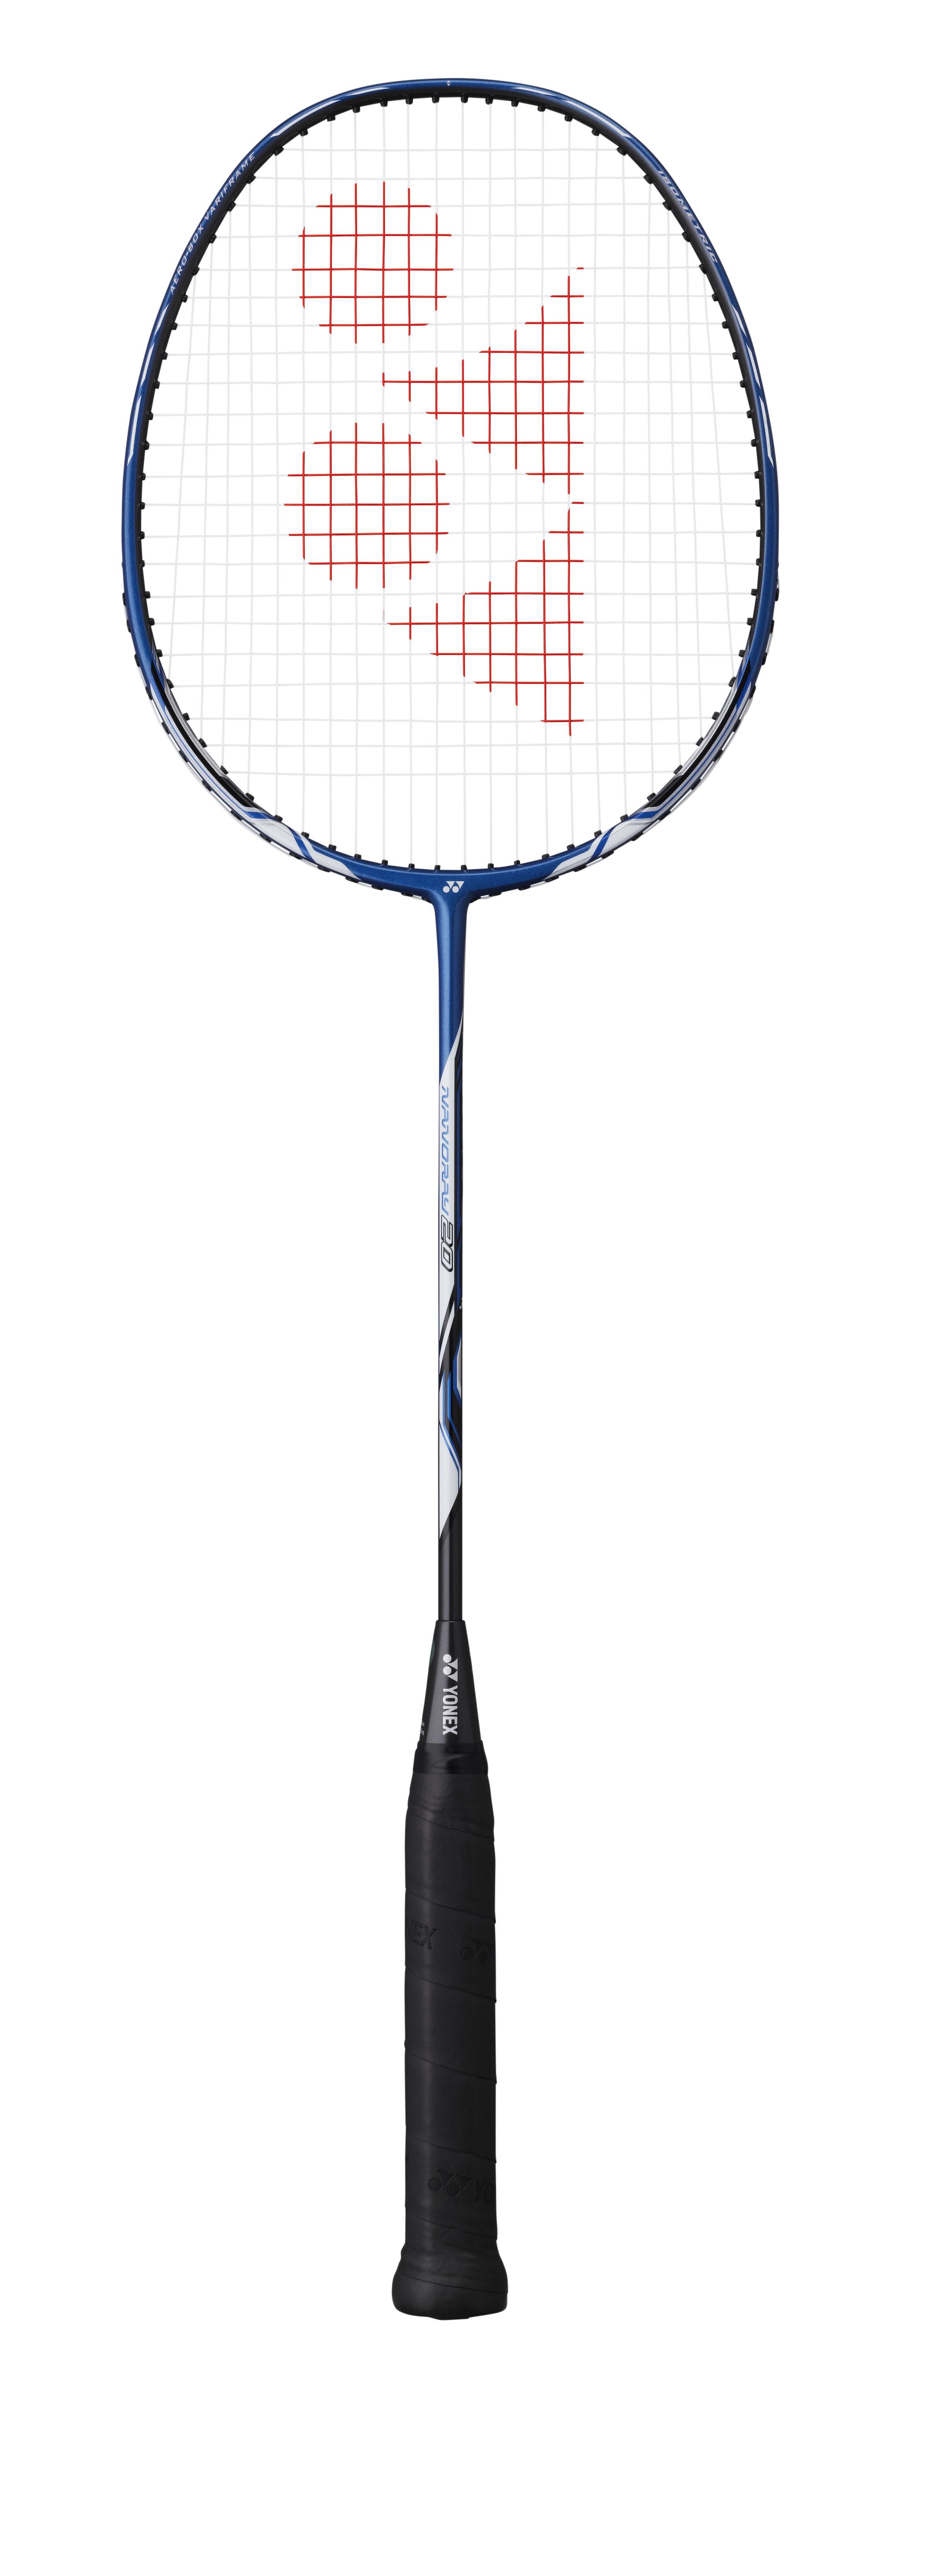 Yonex Nanoray 20 Racchetta Badminton Racchetta Da Badminton Racchetta -  - ebay.it